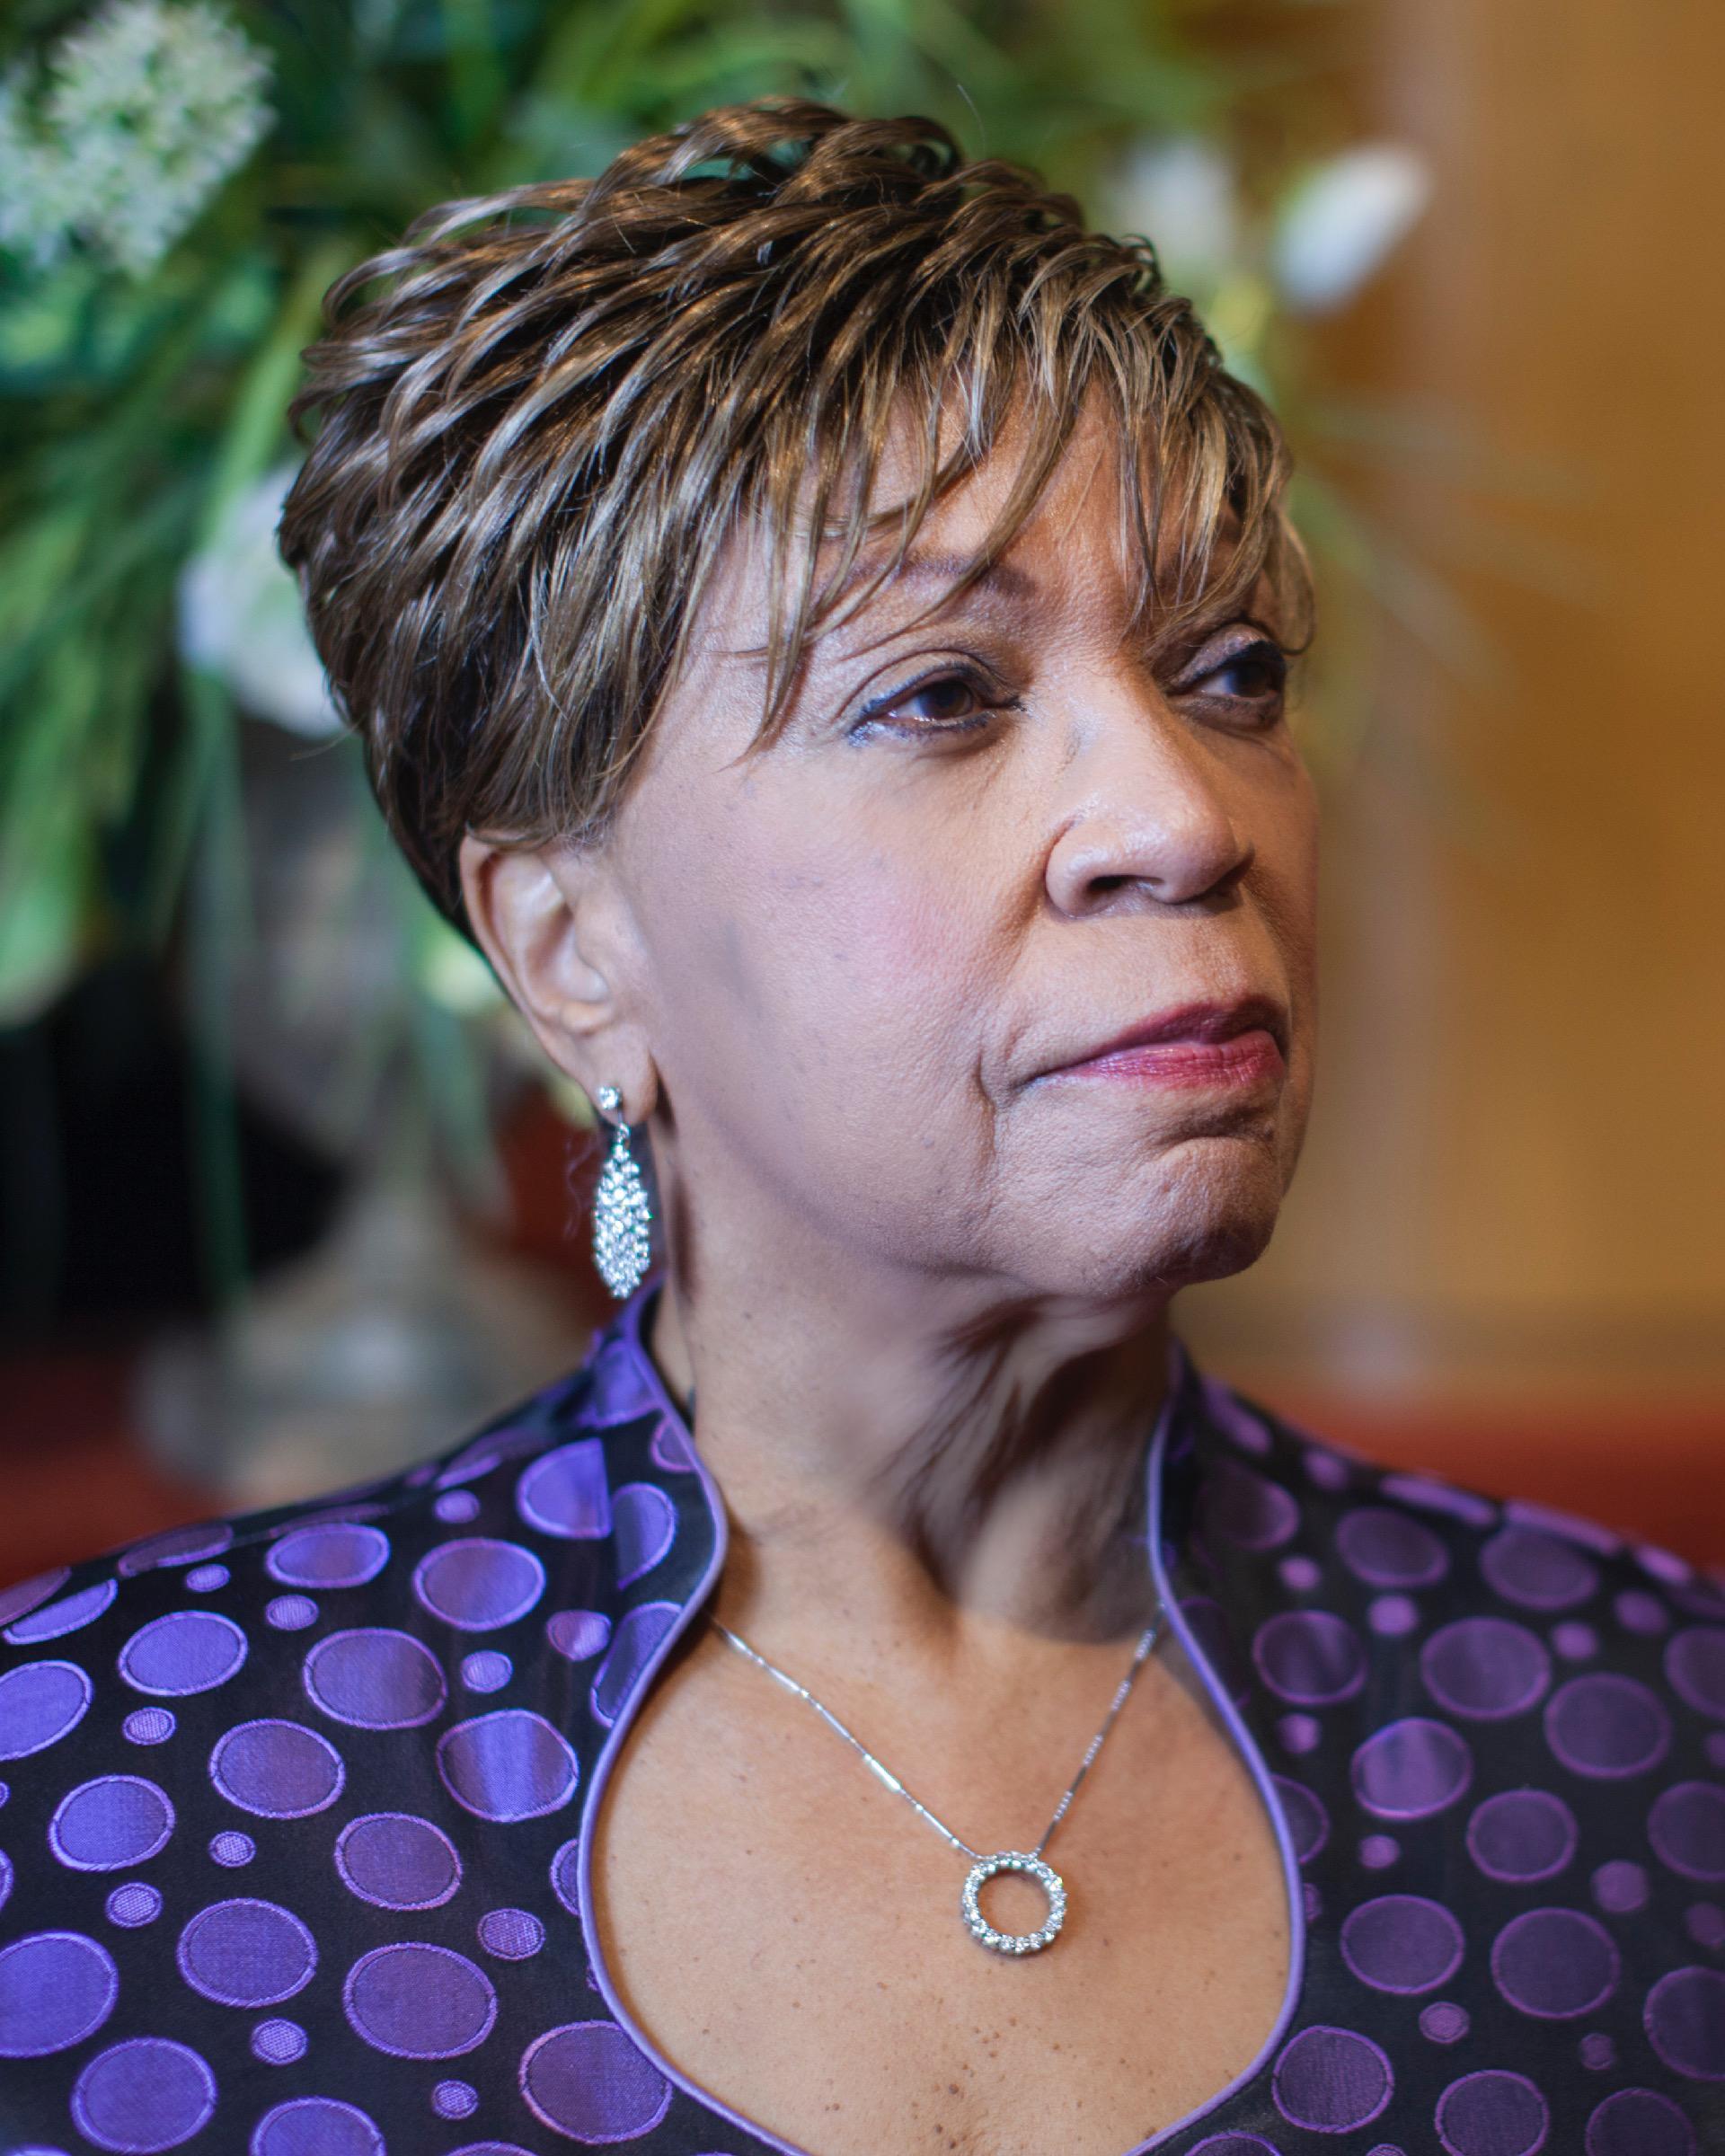 Jacqueline E Smith | Cleveland, Tennessee | prophetessjacq@aol.com